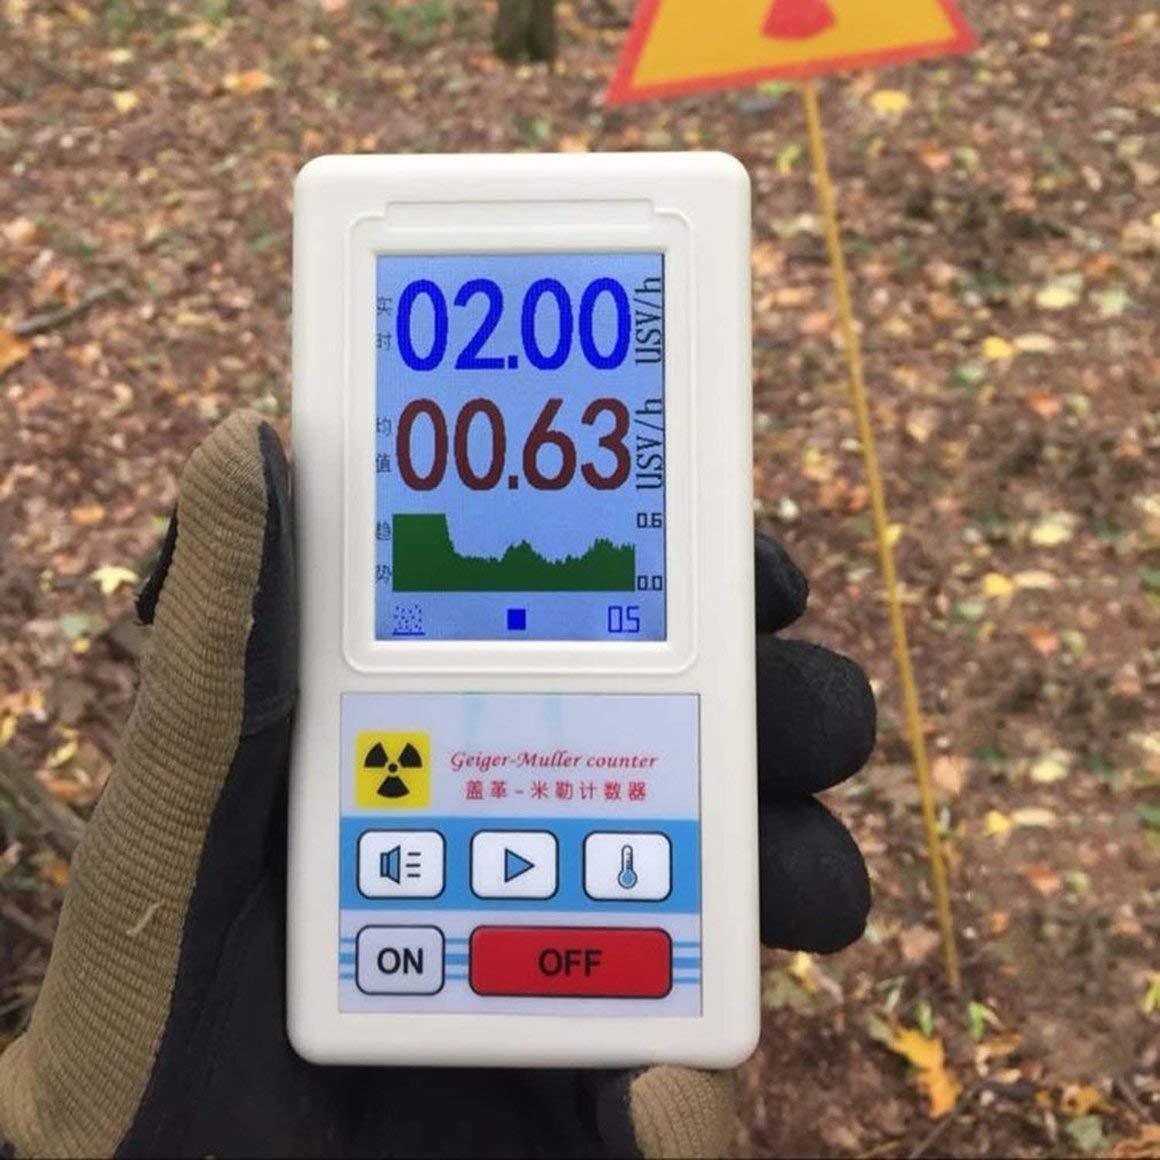 Funnyrunstore Contador Detector de radiación nuclear Rayos de rayos X Dosímetros Probador de mármol Pantalla de pantalla Dosímetro de radiación Contadores ...